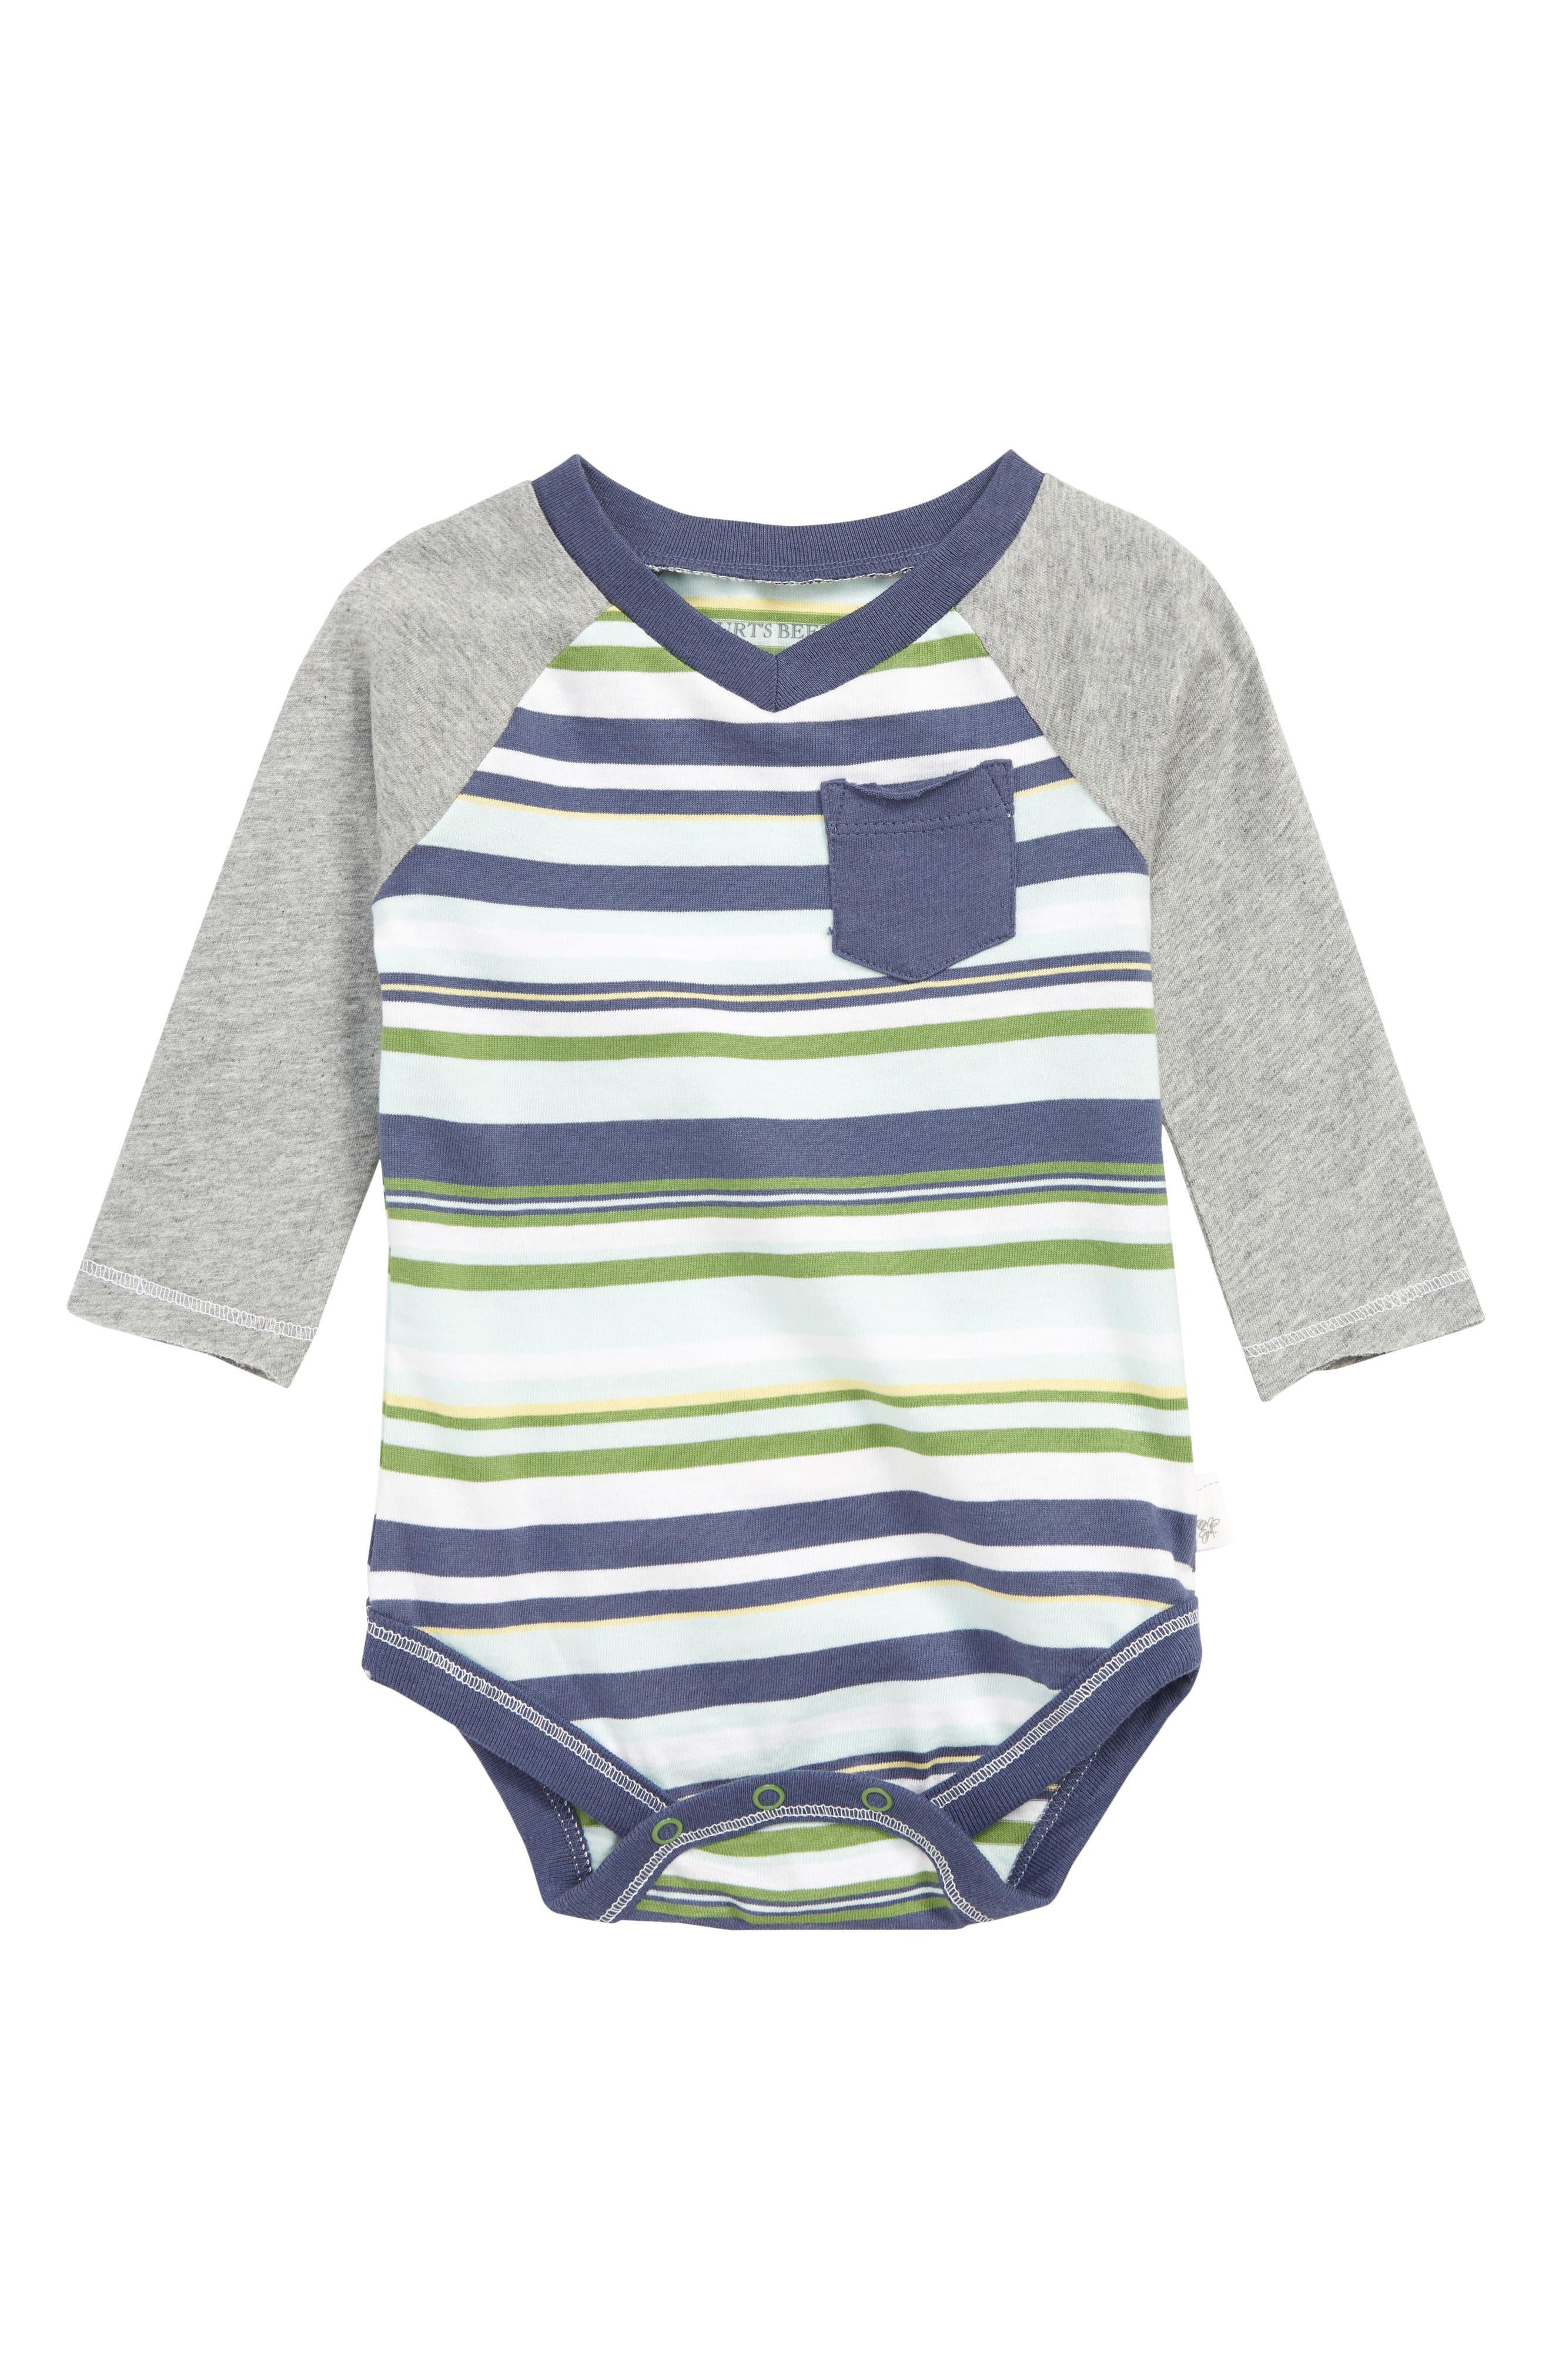 BURT'S BEES BABY Vintage Stripe Organic Cotton Bodysuit, Main, color, INDIGO